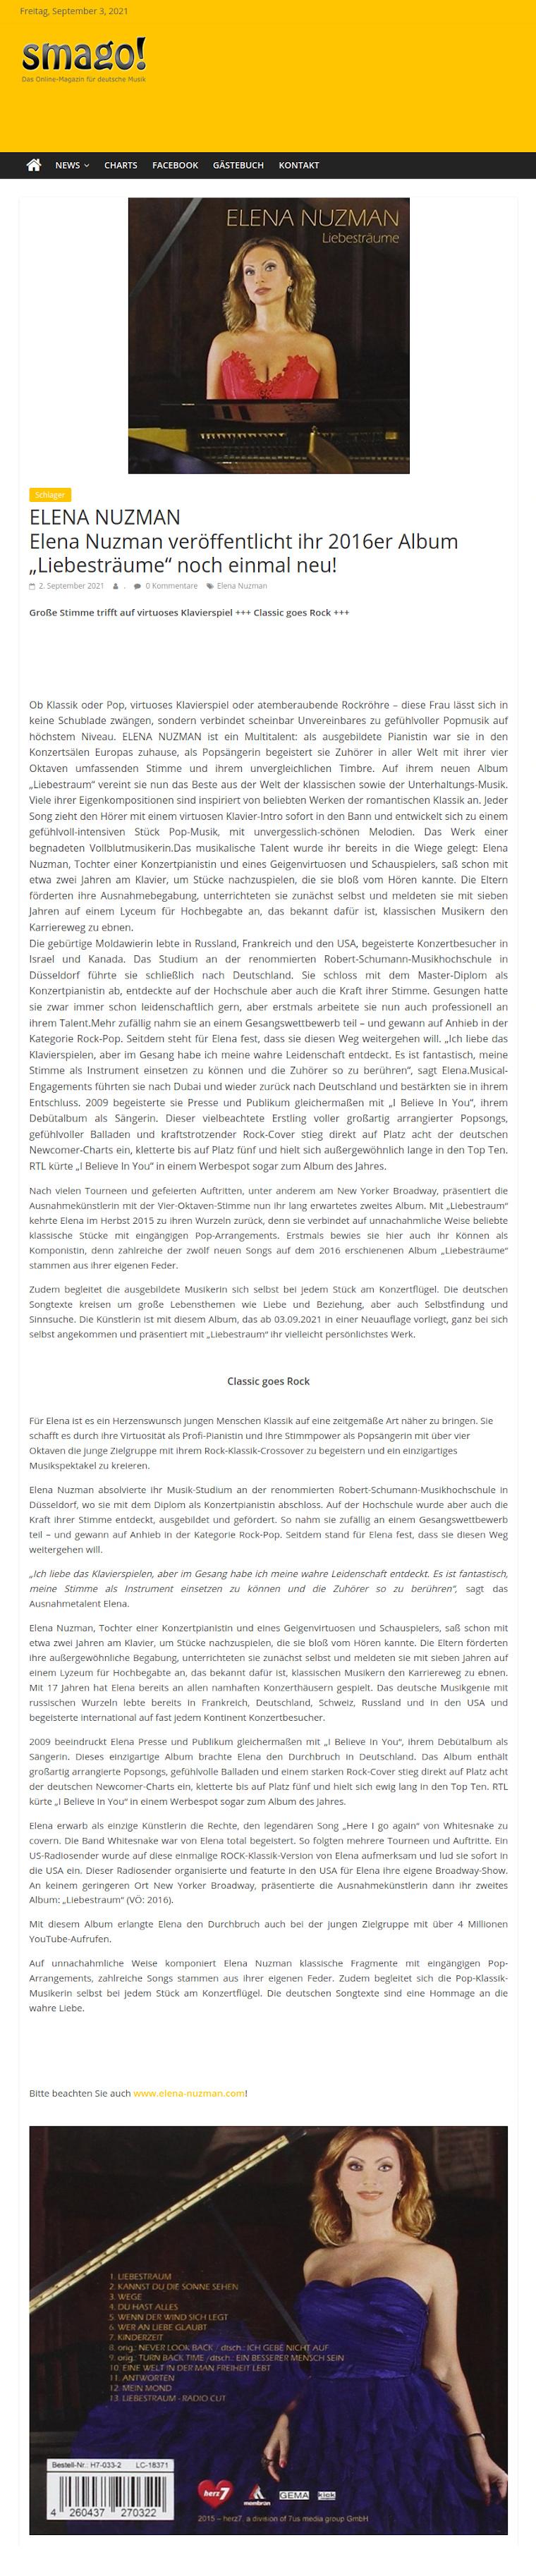 Elena Nuzman - Aktuell - smago.de - September 2021